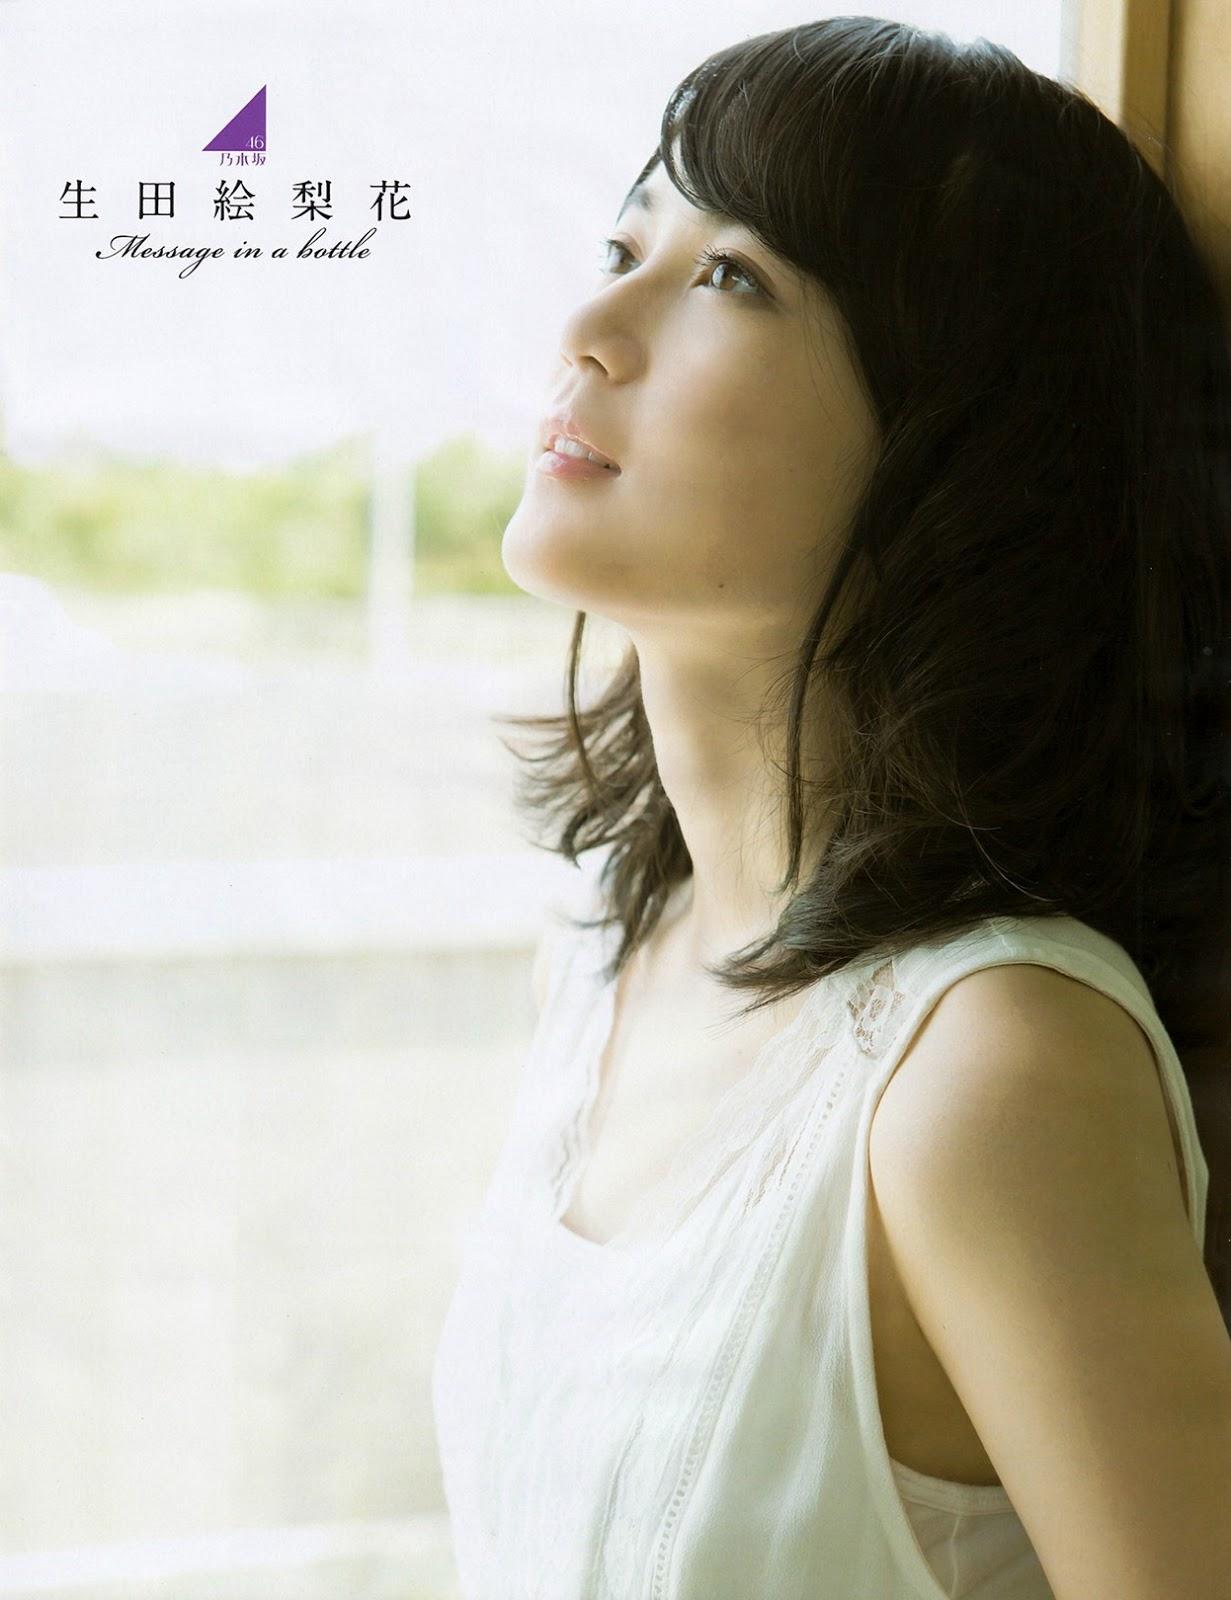 Ikuta Erika 生田絵梨花 Nogizaka46, Ex-Taishu 2016.11 (EX大衆 11月号)